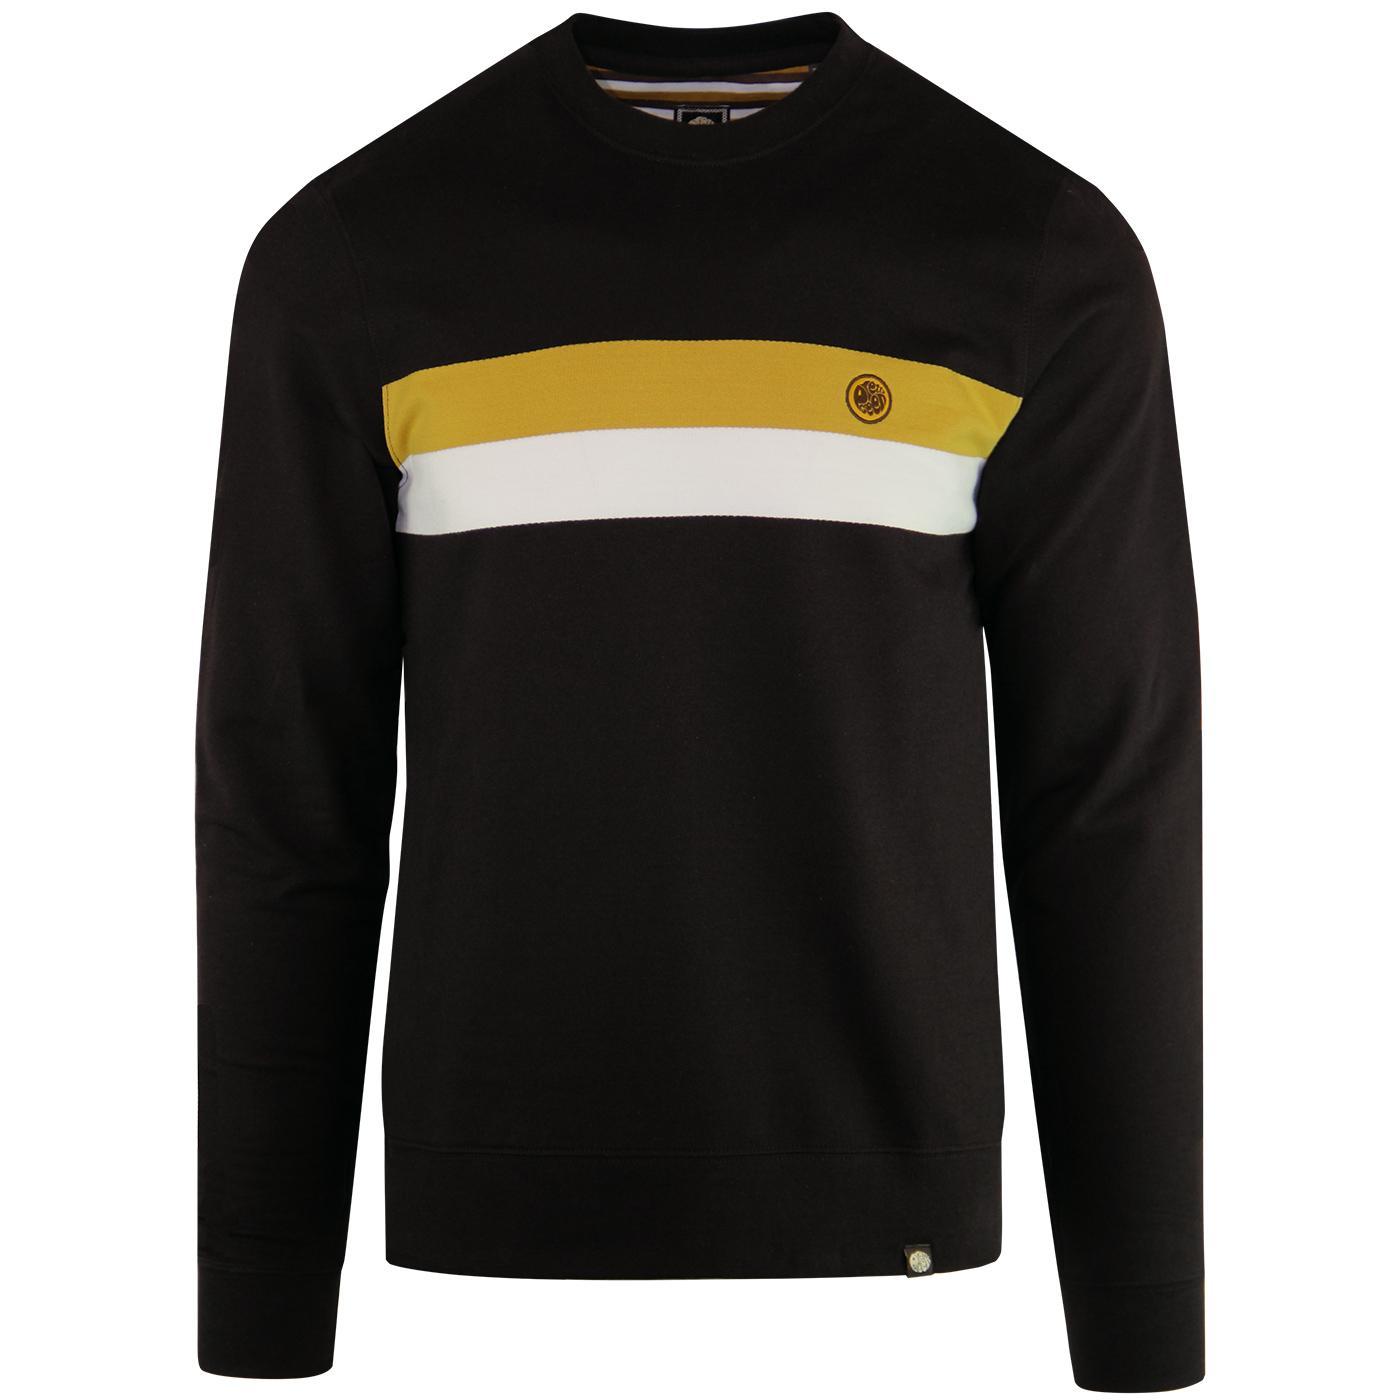 PRETTY GREEN Retro Chest Stripe Sweatshirt (Brown)